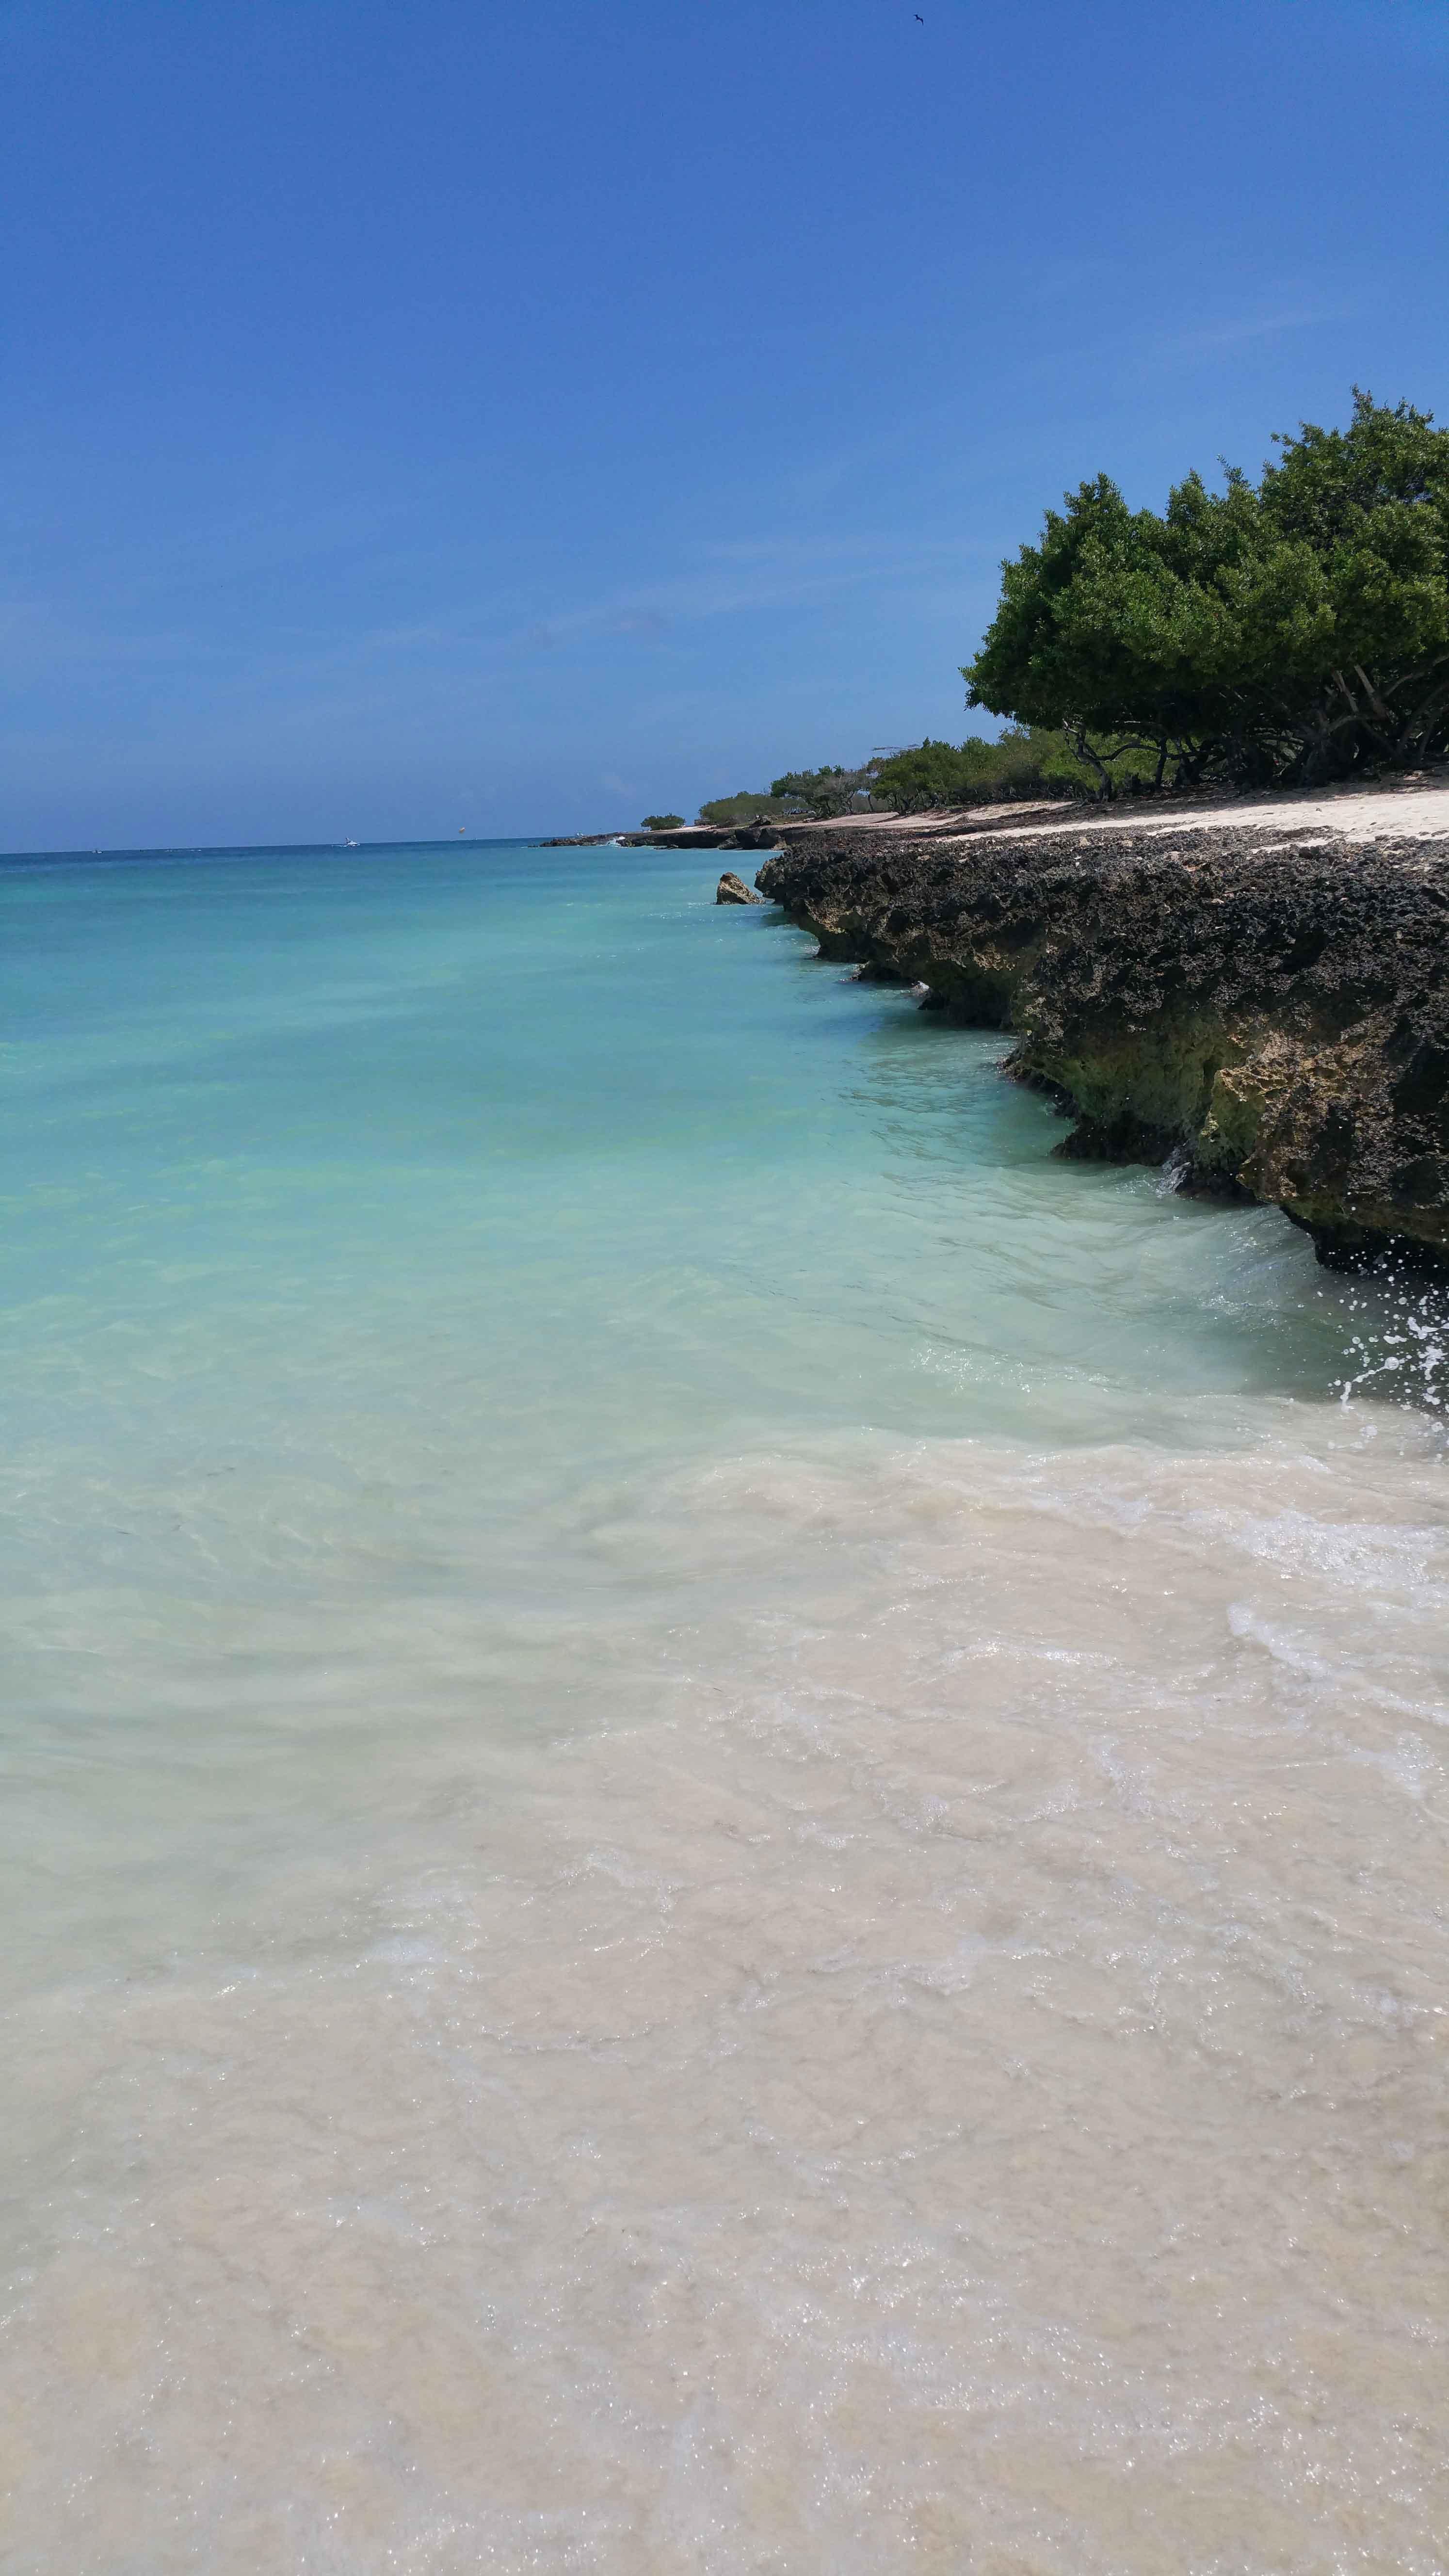 Vakantiewoning Eagle beach st 2 - OMGEVING